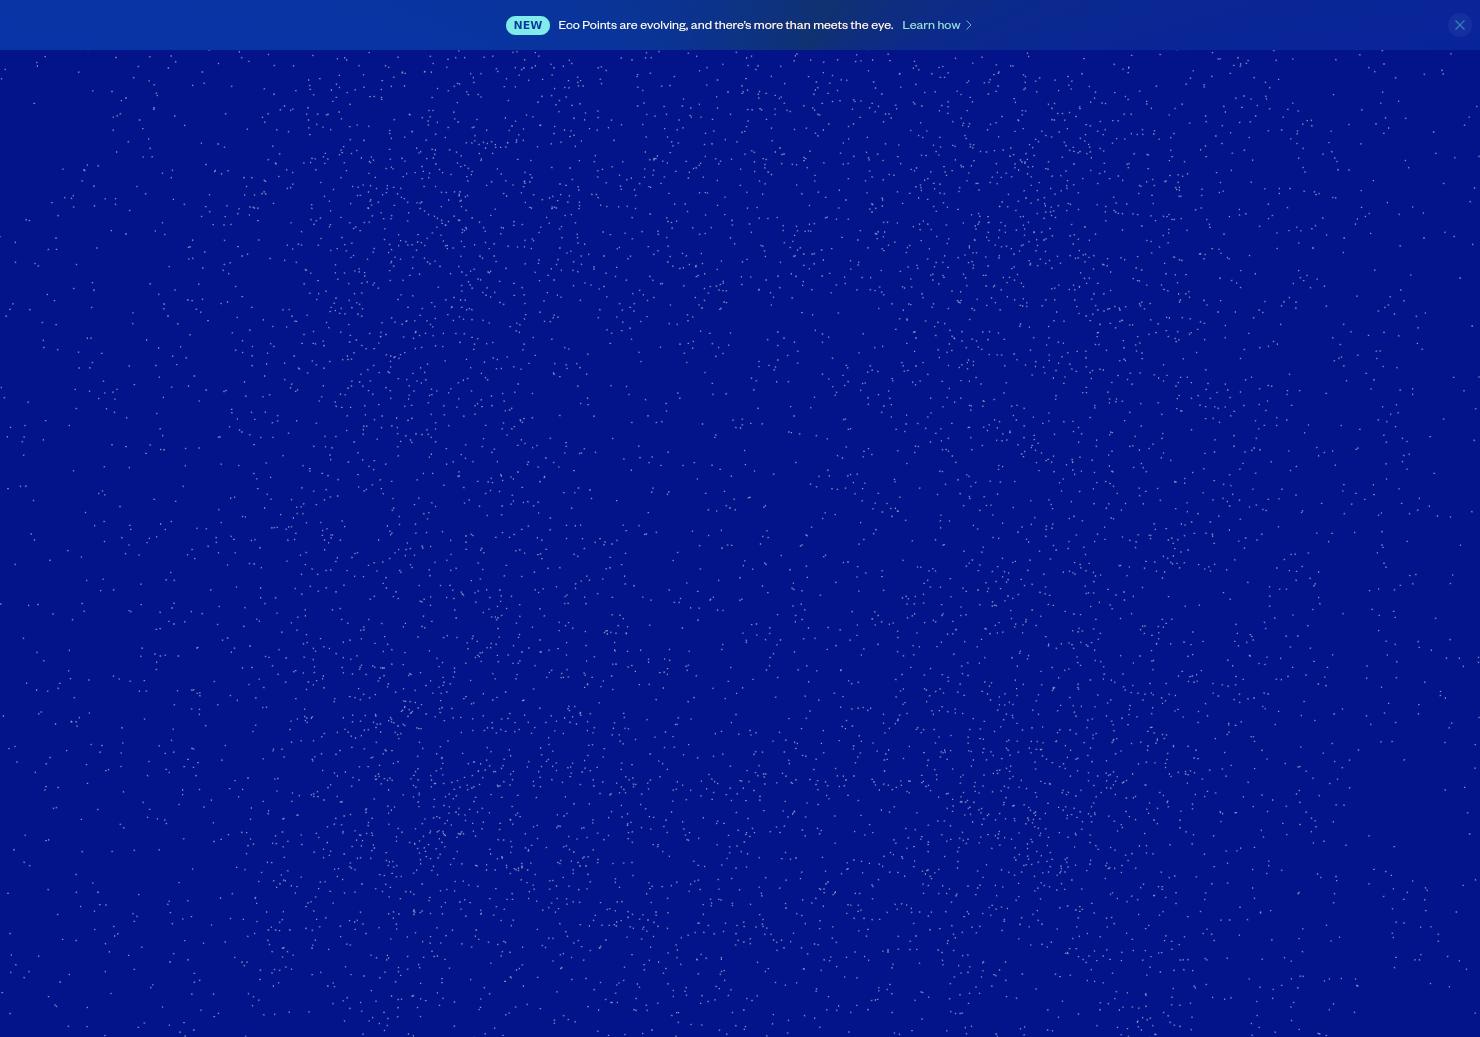 The Eco App